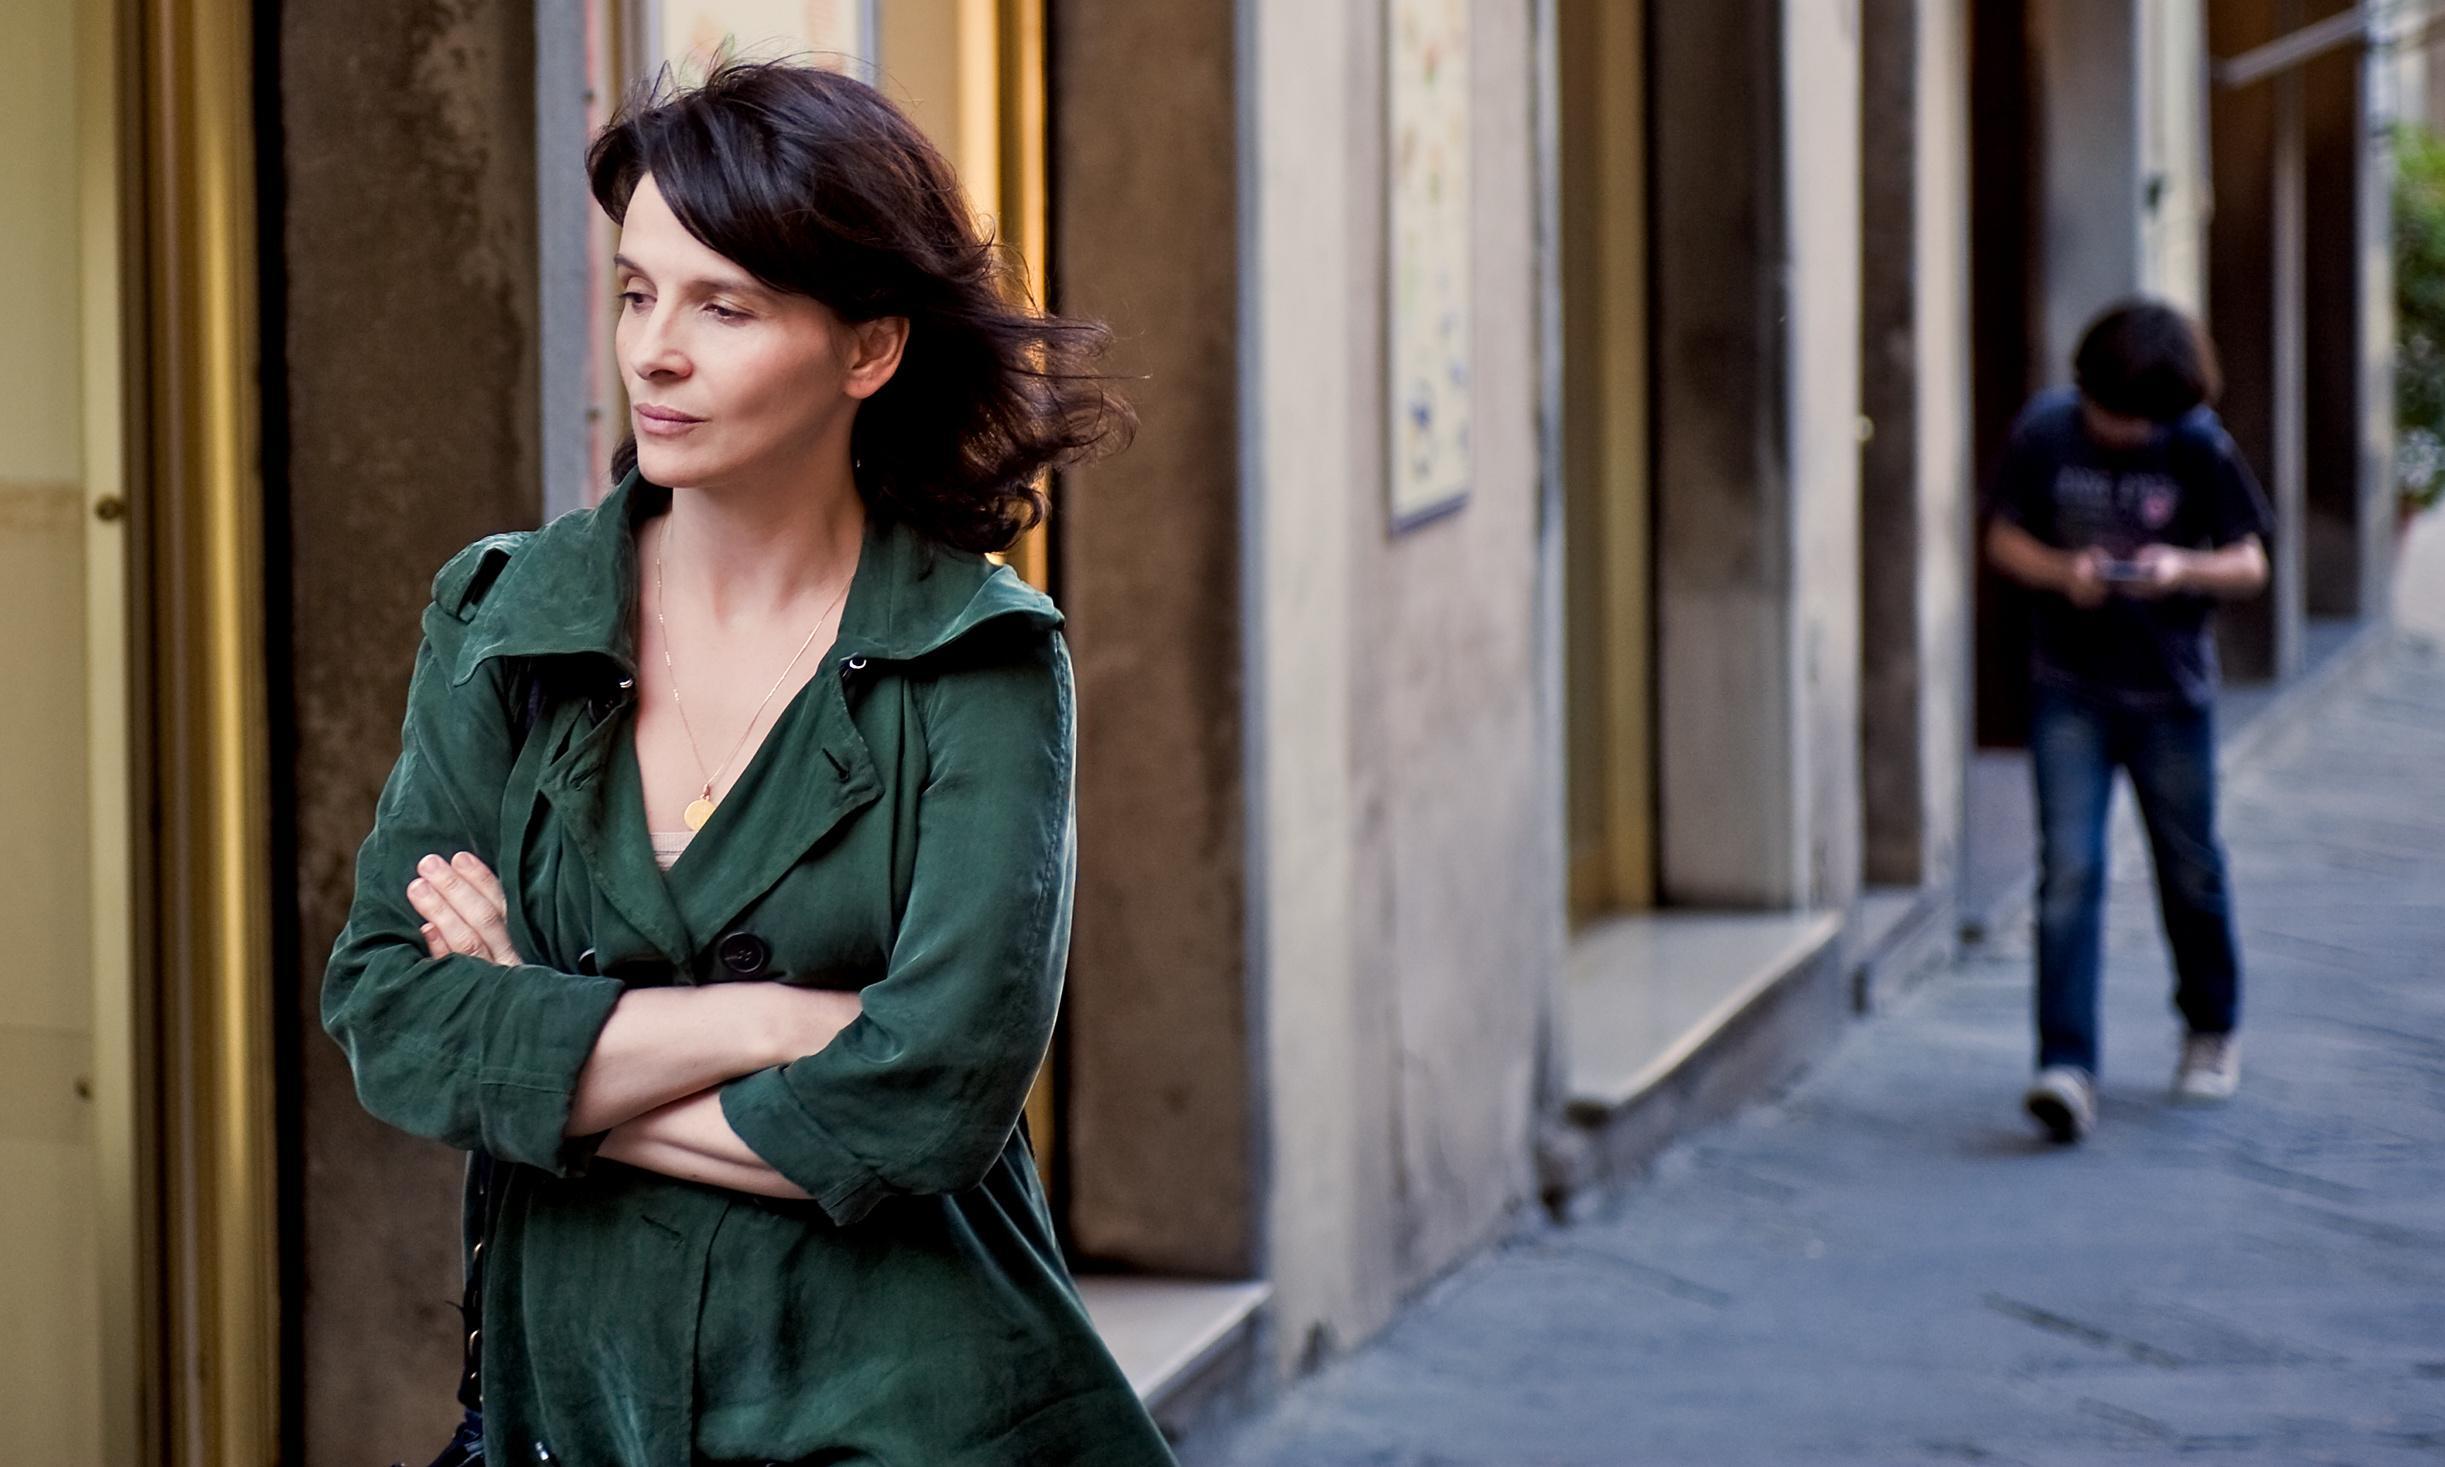 I'm a trans woman. Kiarostami's films helped me escape a prison of the mind